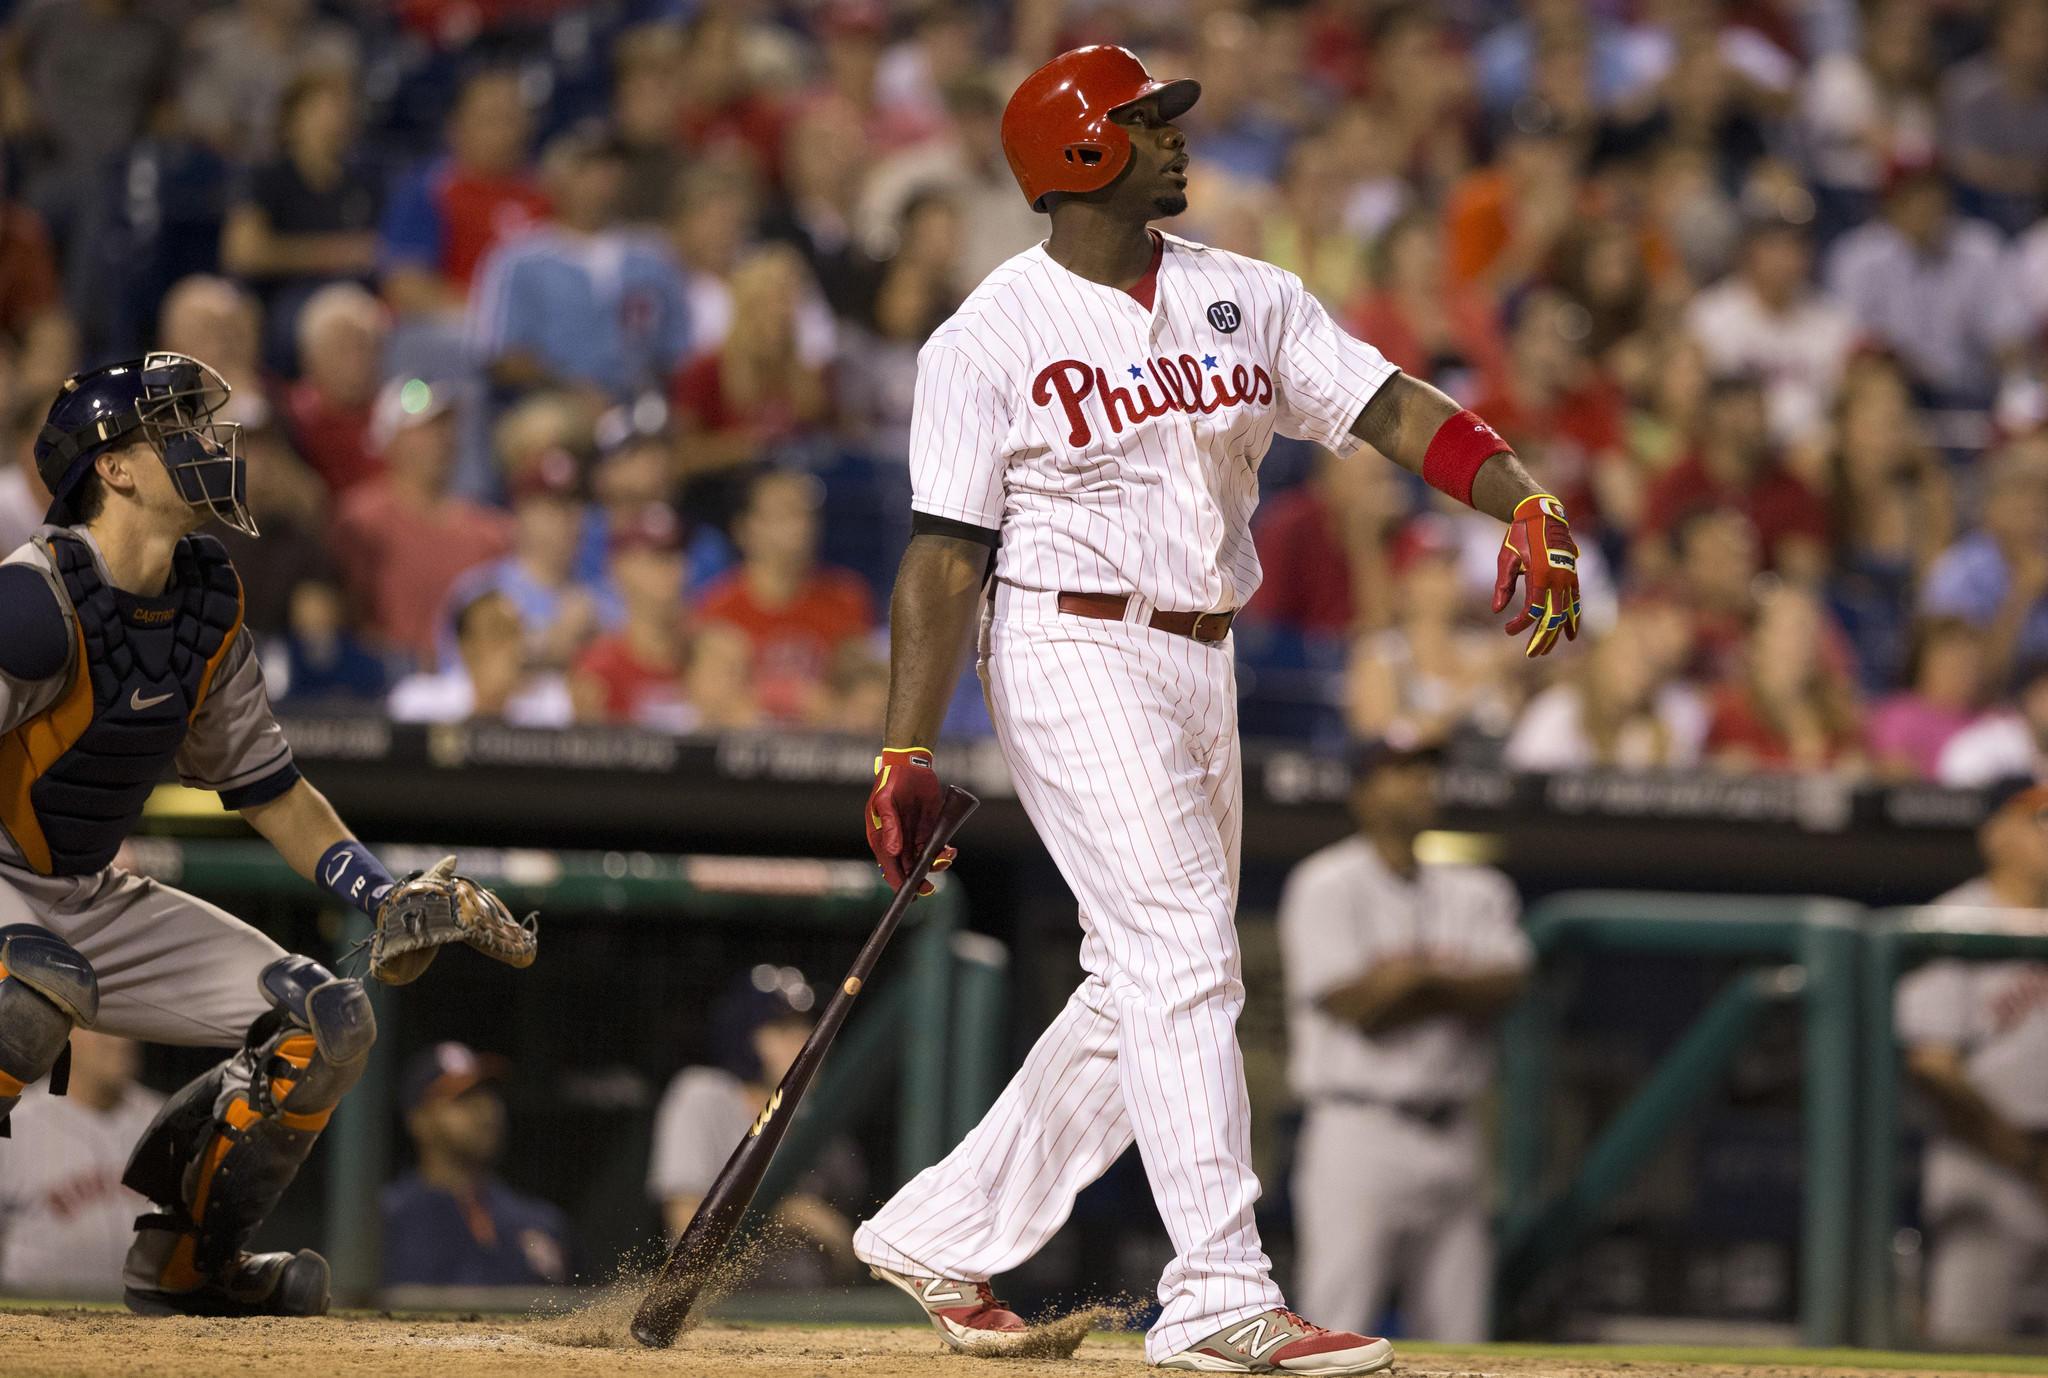 PHILADELPHIA, PA - AUGUST 7: Ryan Howard #6 of the Philadelphia Phillies hits a grand slam in the bottom of the eighth inning against the Houston Astros on August 7, 2014 at Citizens Bank Park in Philadelphia, Pennsylvania.